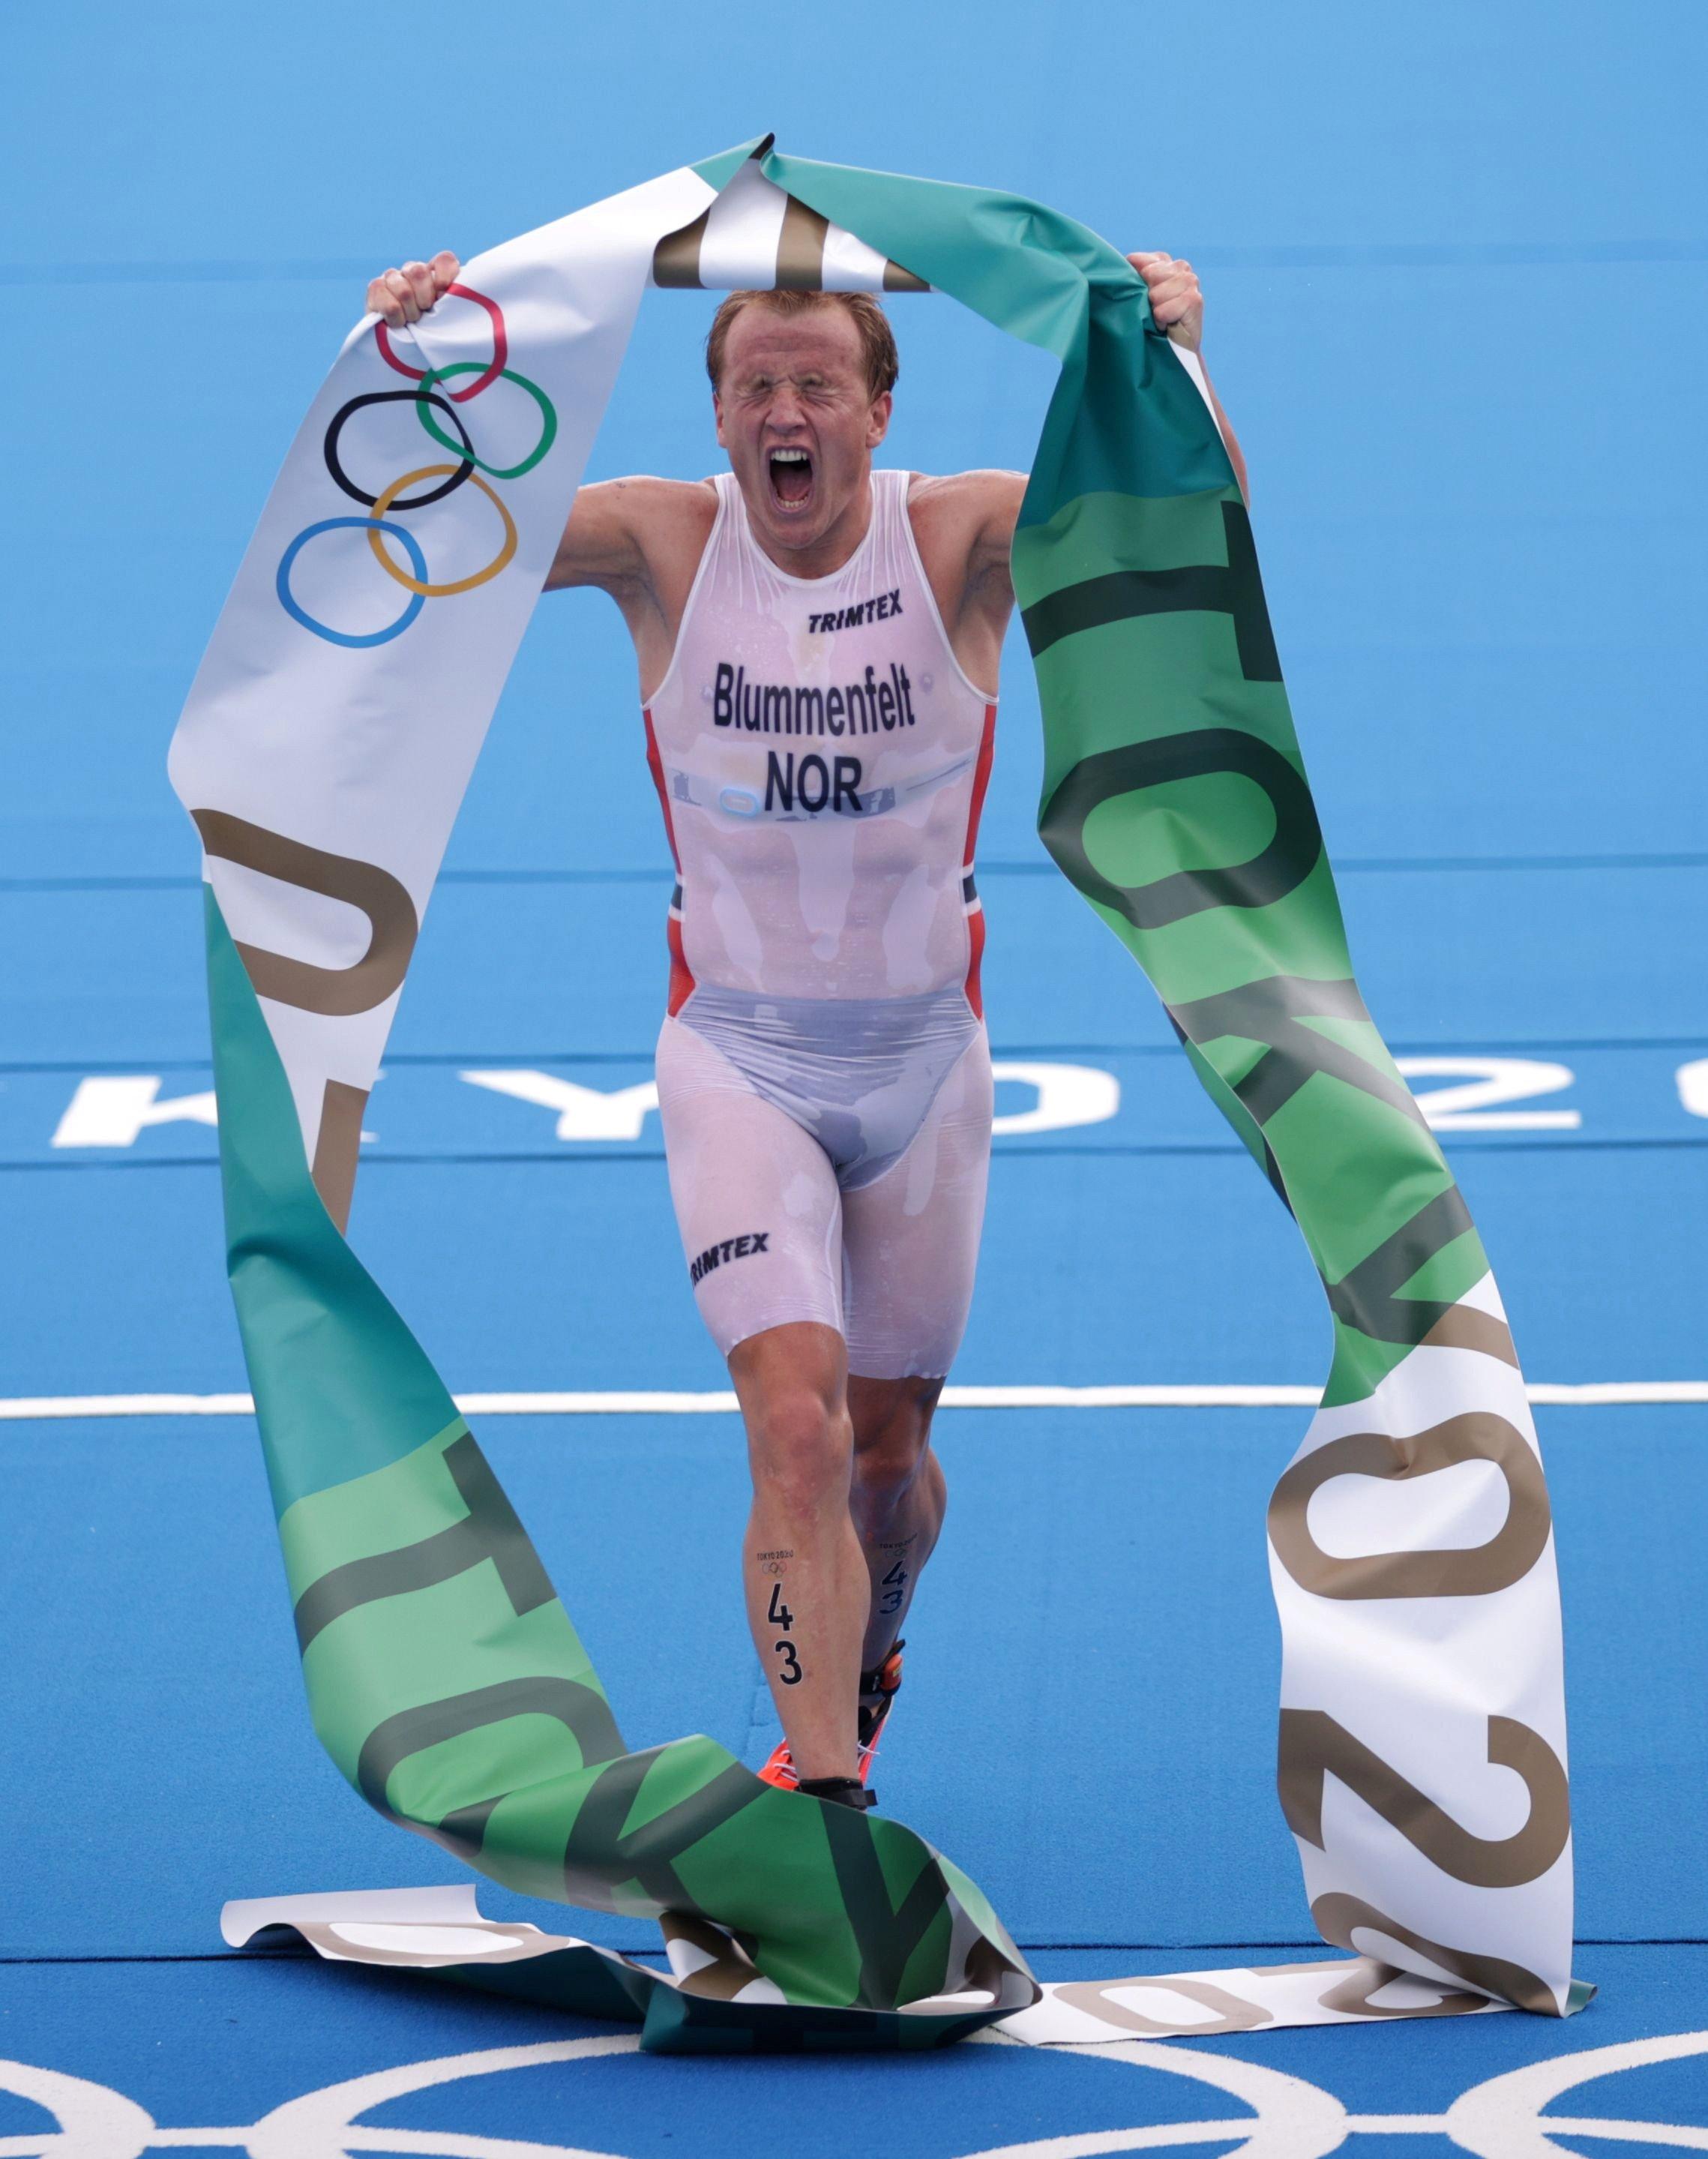 Norway's Kristian Blummenfelt celebrates winning the Tokyo 2020 Olympics Men's Triathlon event at the Odaiba Marine Park, Tokyo, Japan, July 26, 2021. (Reuters Photo)